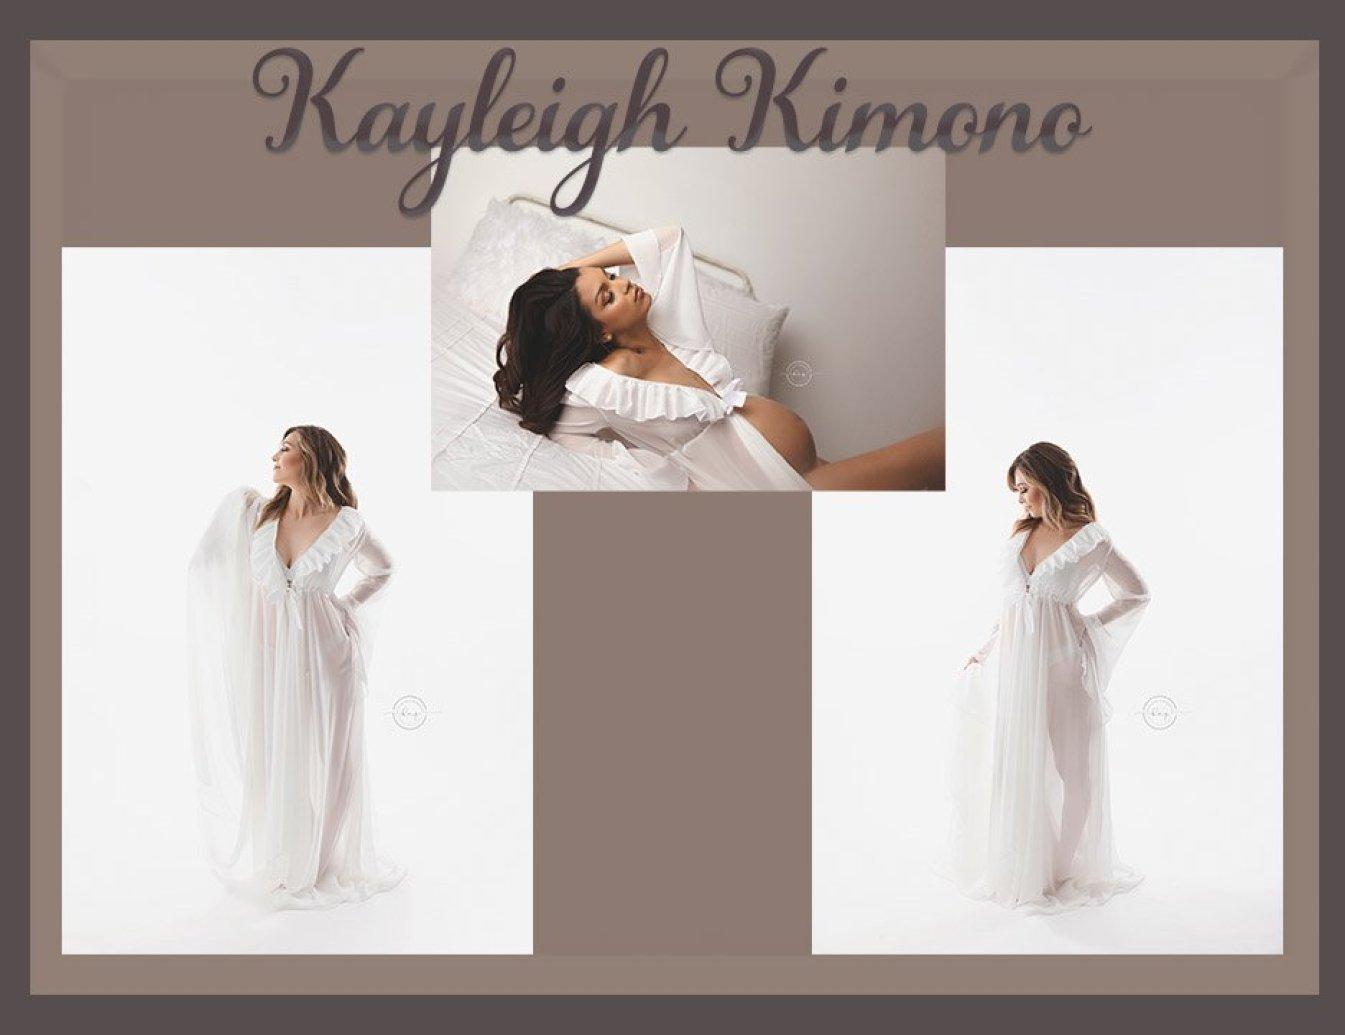 kimono, maternity gown photography, maternity dress photoshoot, baby shower dress, robe, maternity kimono